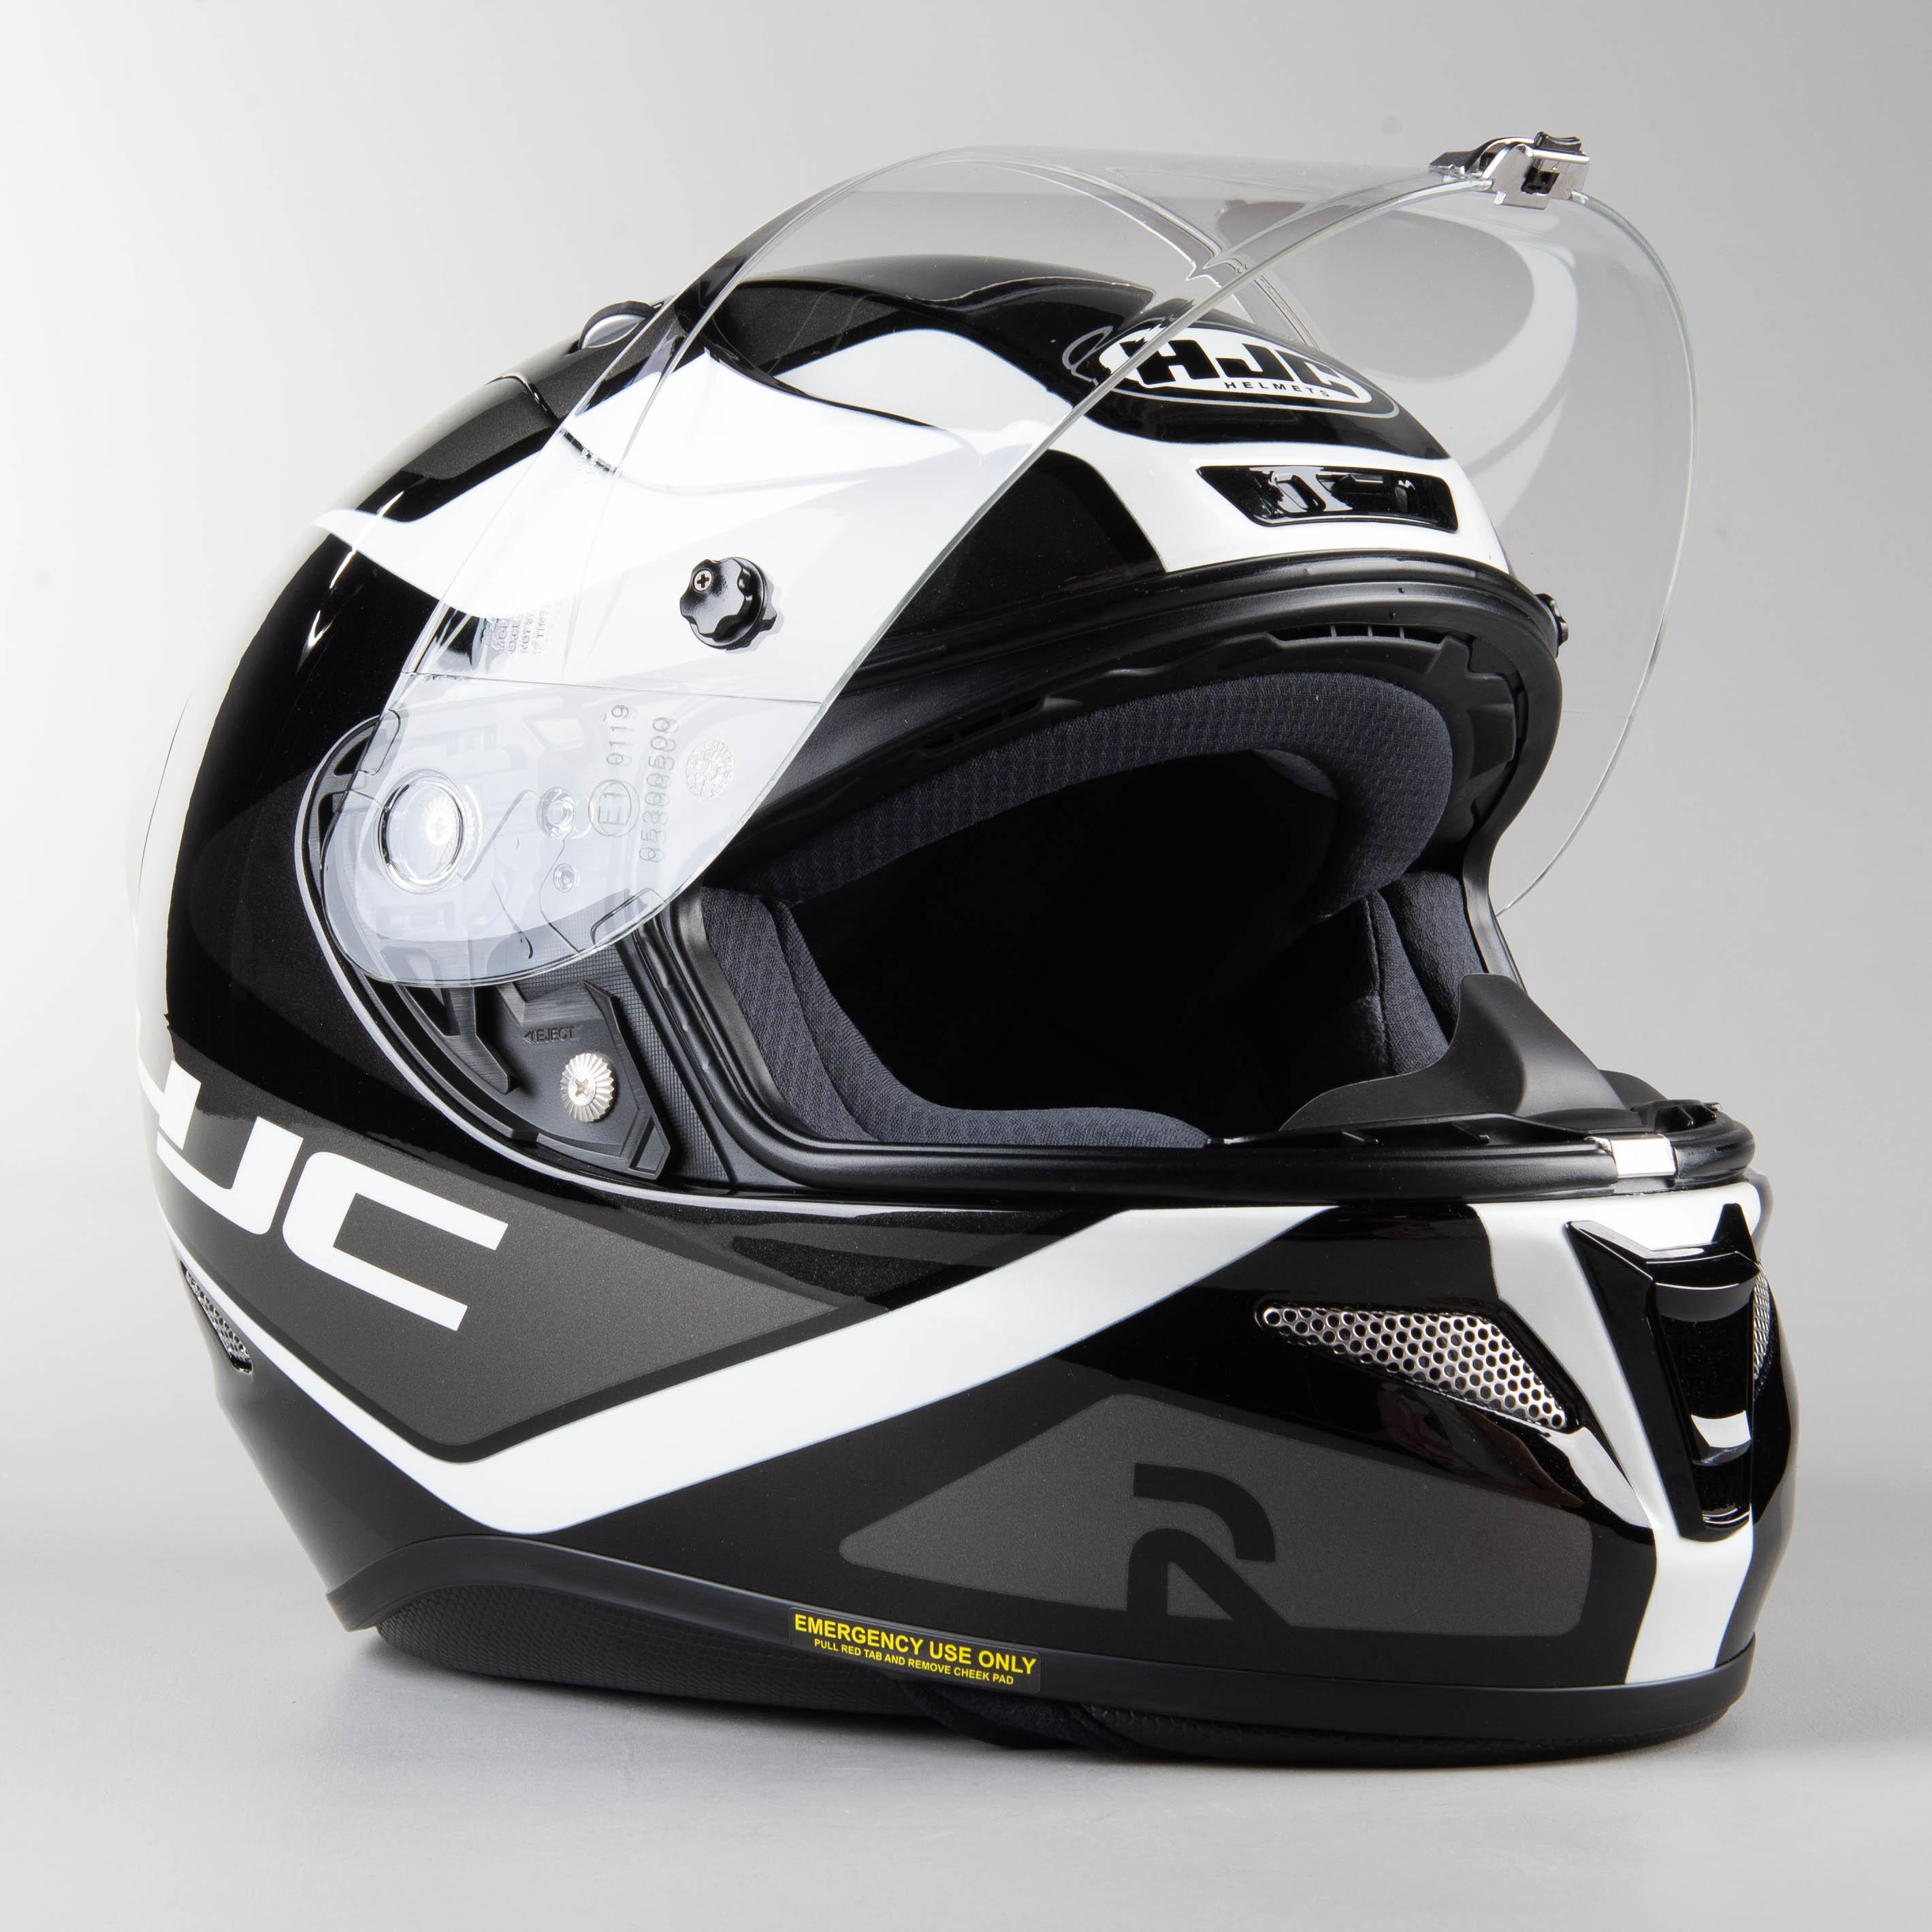 HJC HJC RPHA 11 SCONA MC5 Motorcycle helmets